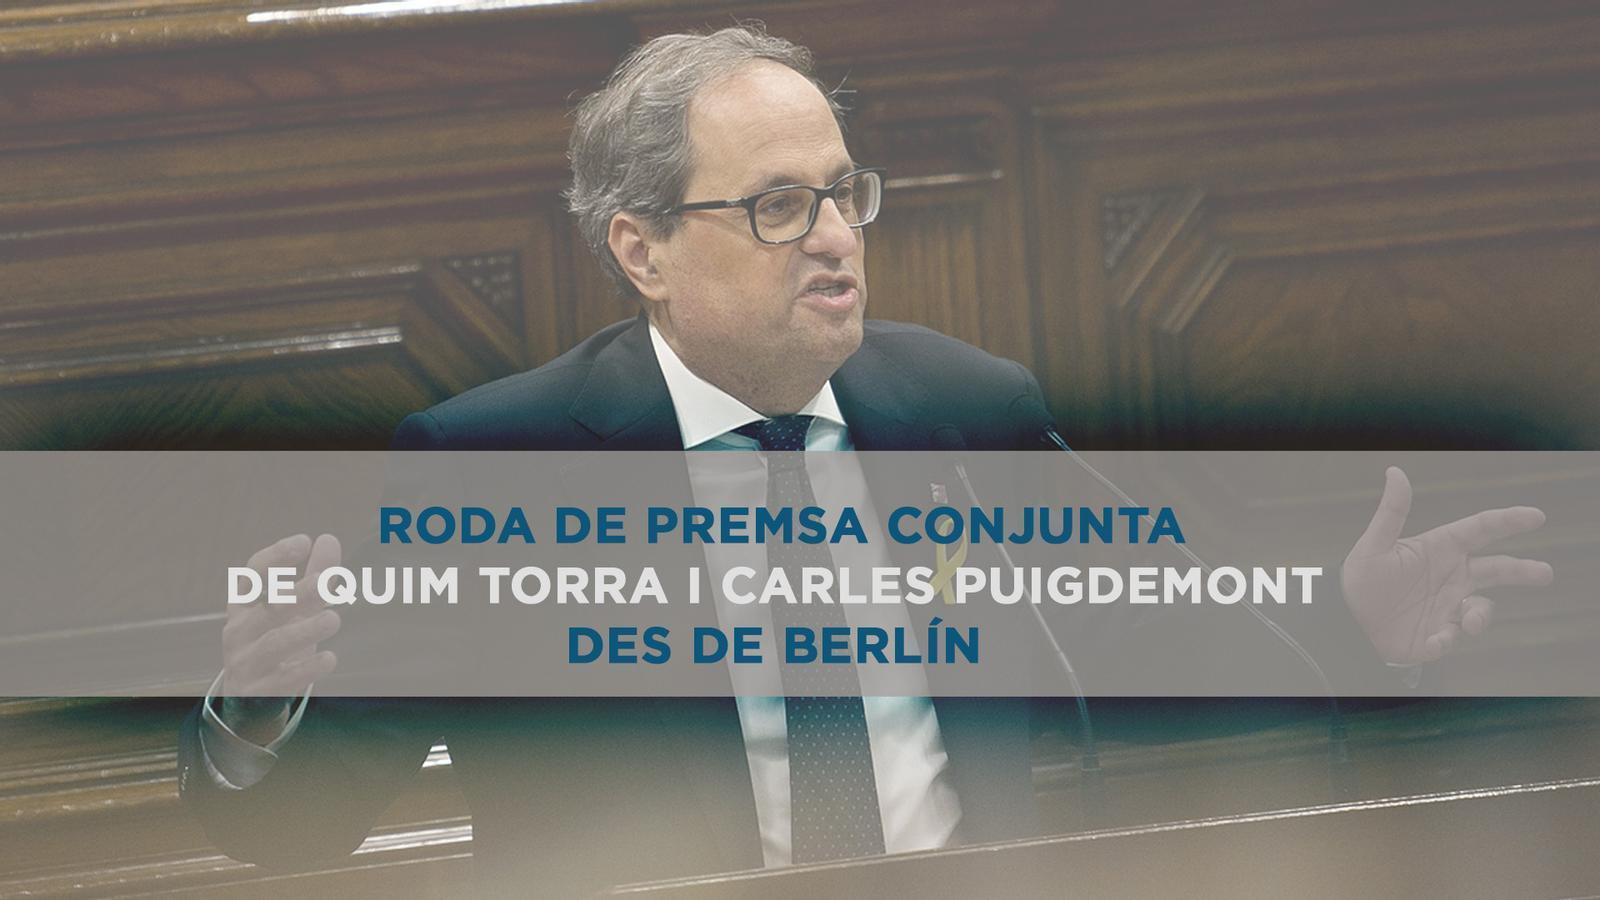 Compareixença de Torra i Puigdemont des de Berlín